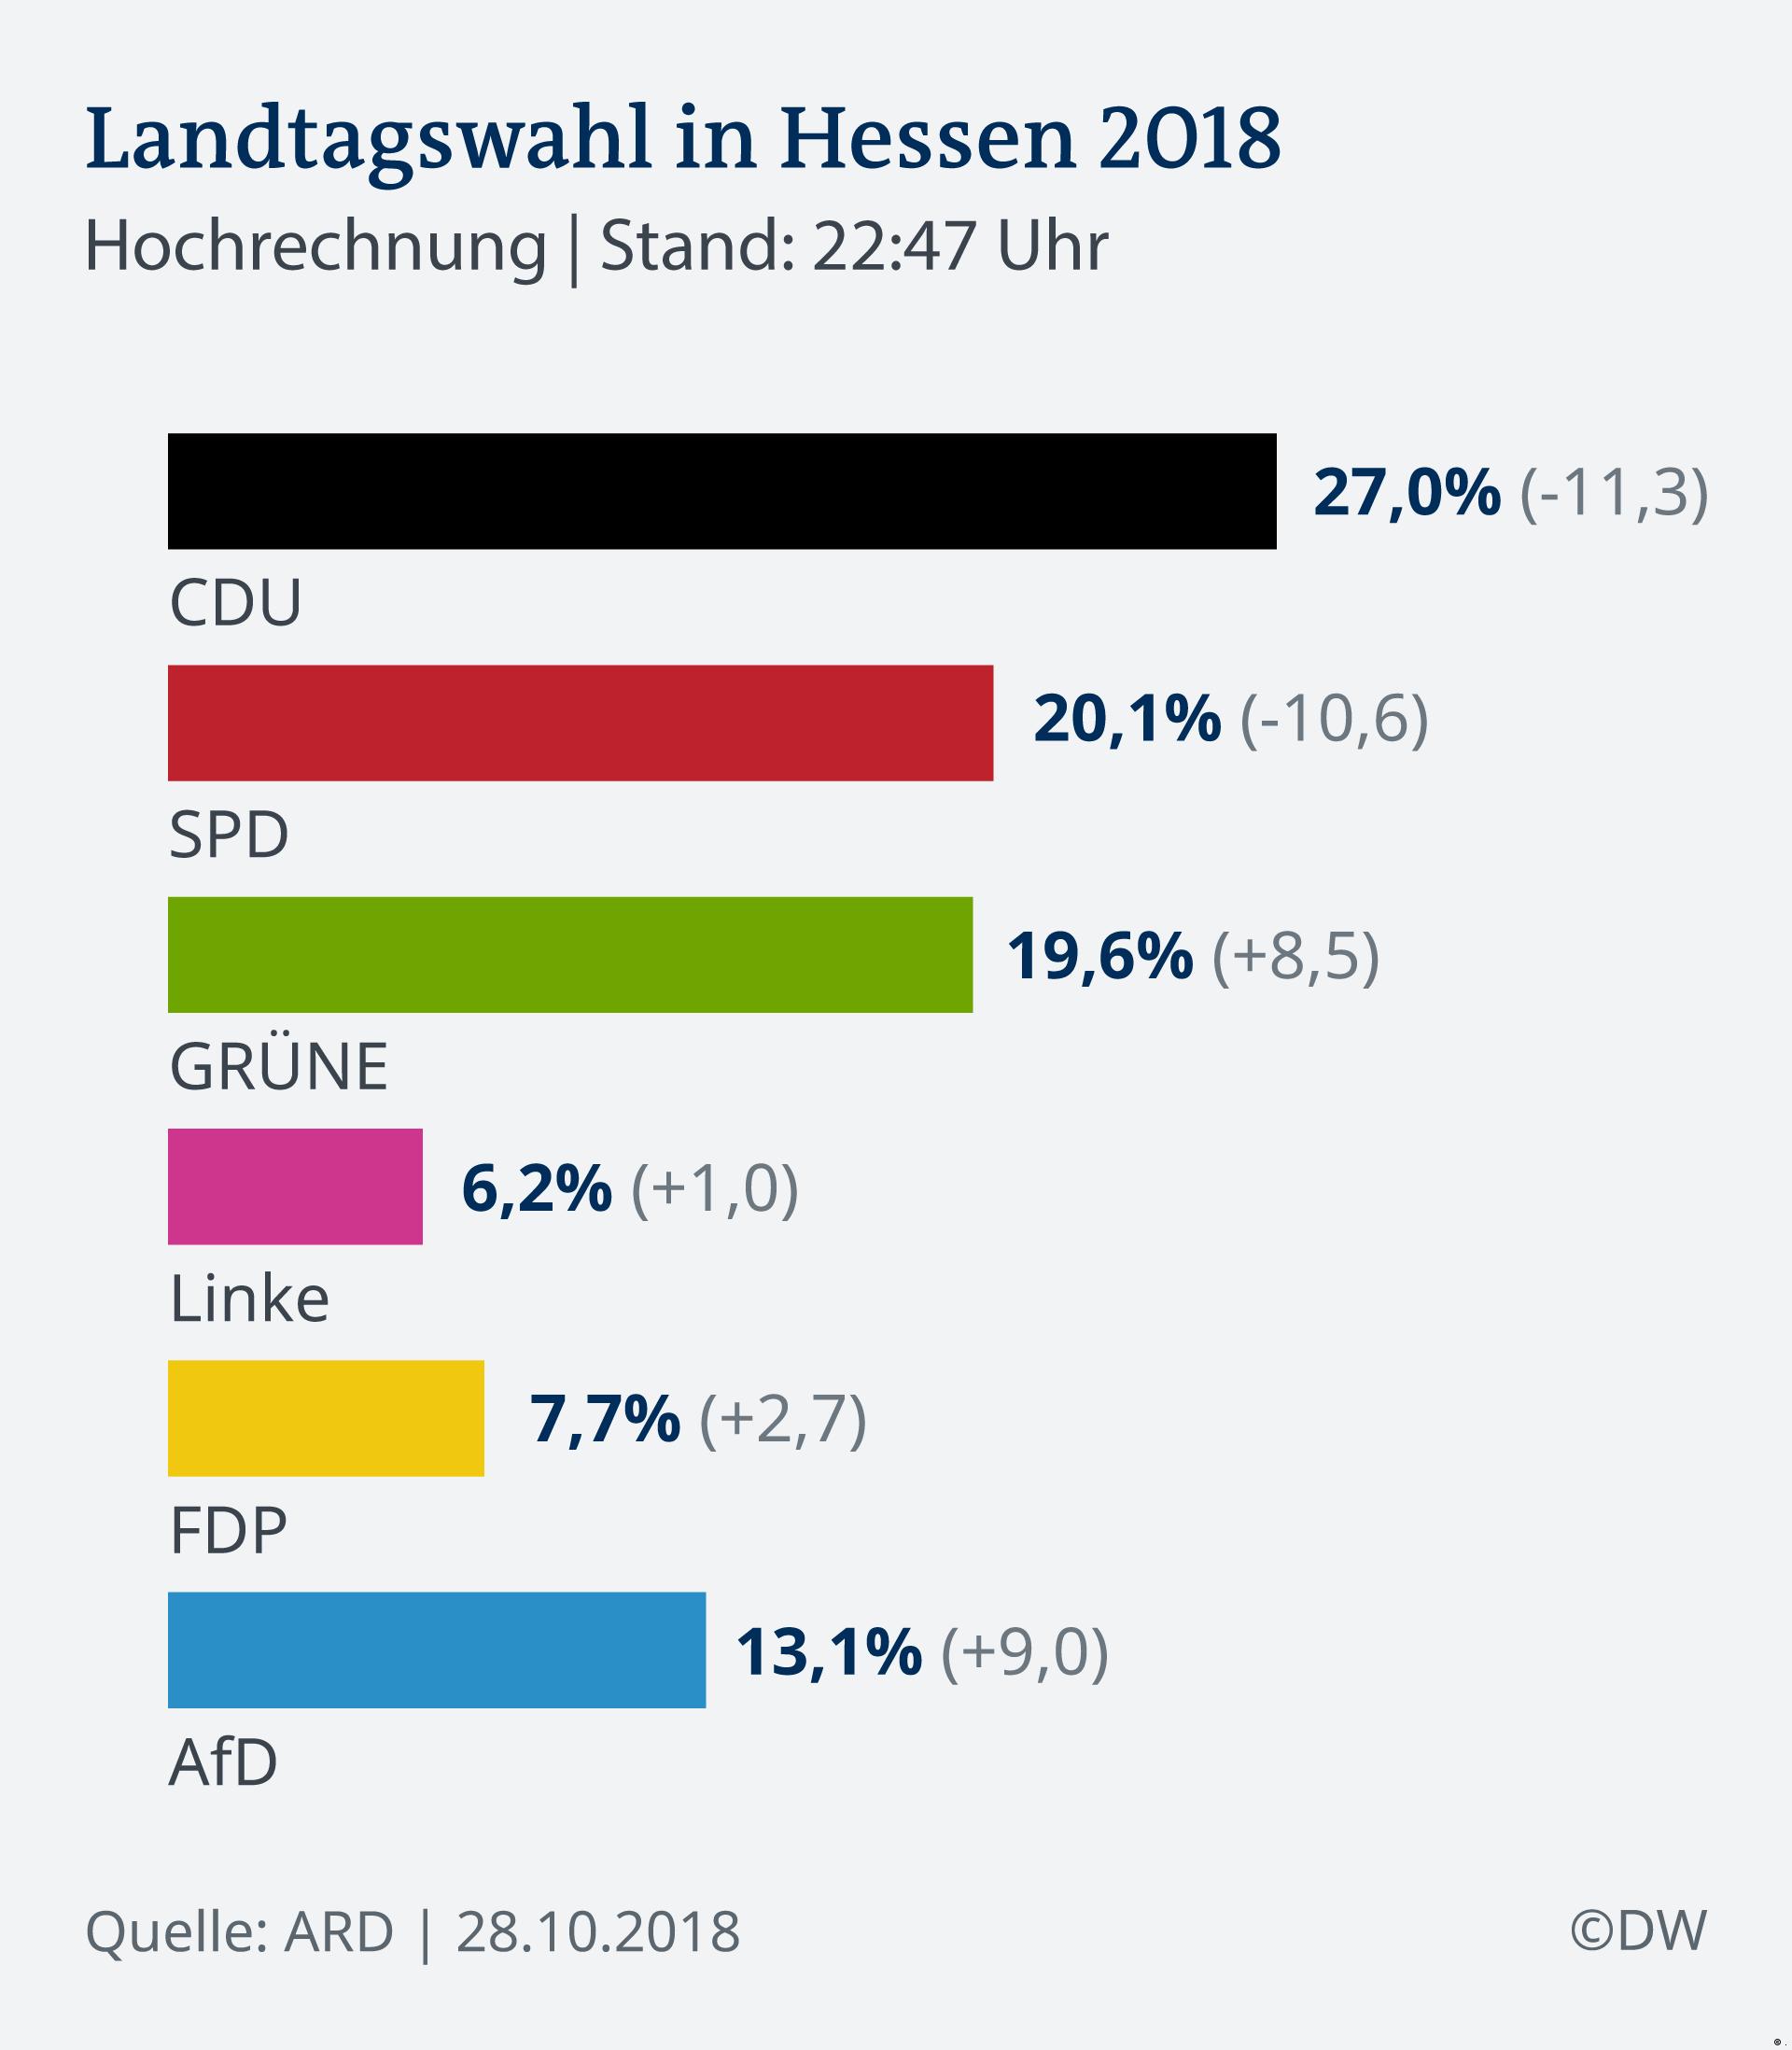 rezultate-slabe-obtinute-de-principalele-partide-germane-in-landul-hessa